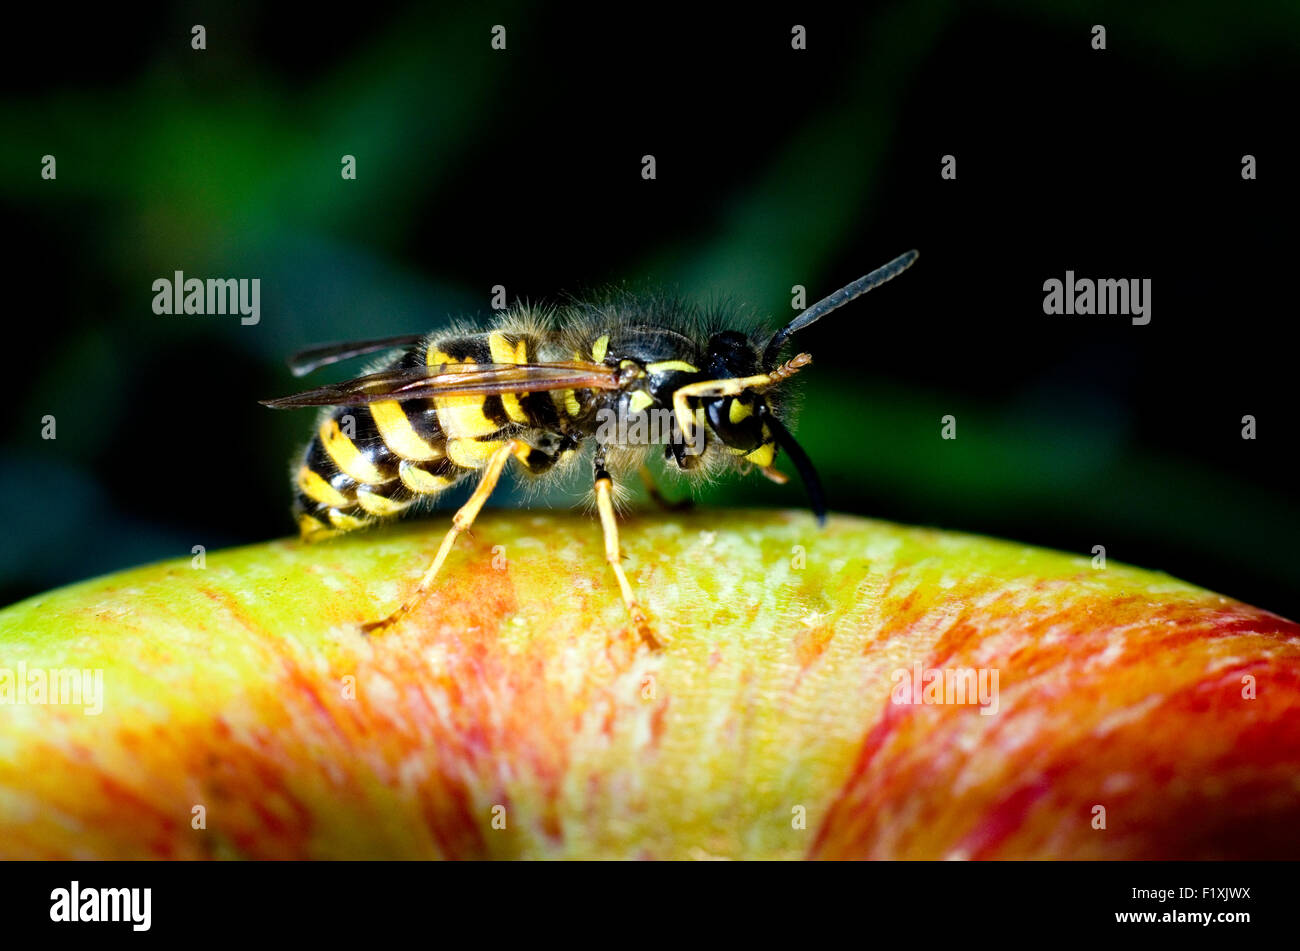 Common wasp (Vespula vulgaris) on an apple (malus domestica). - Stock Image